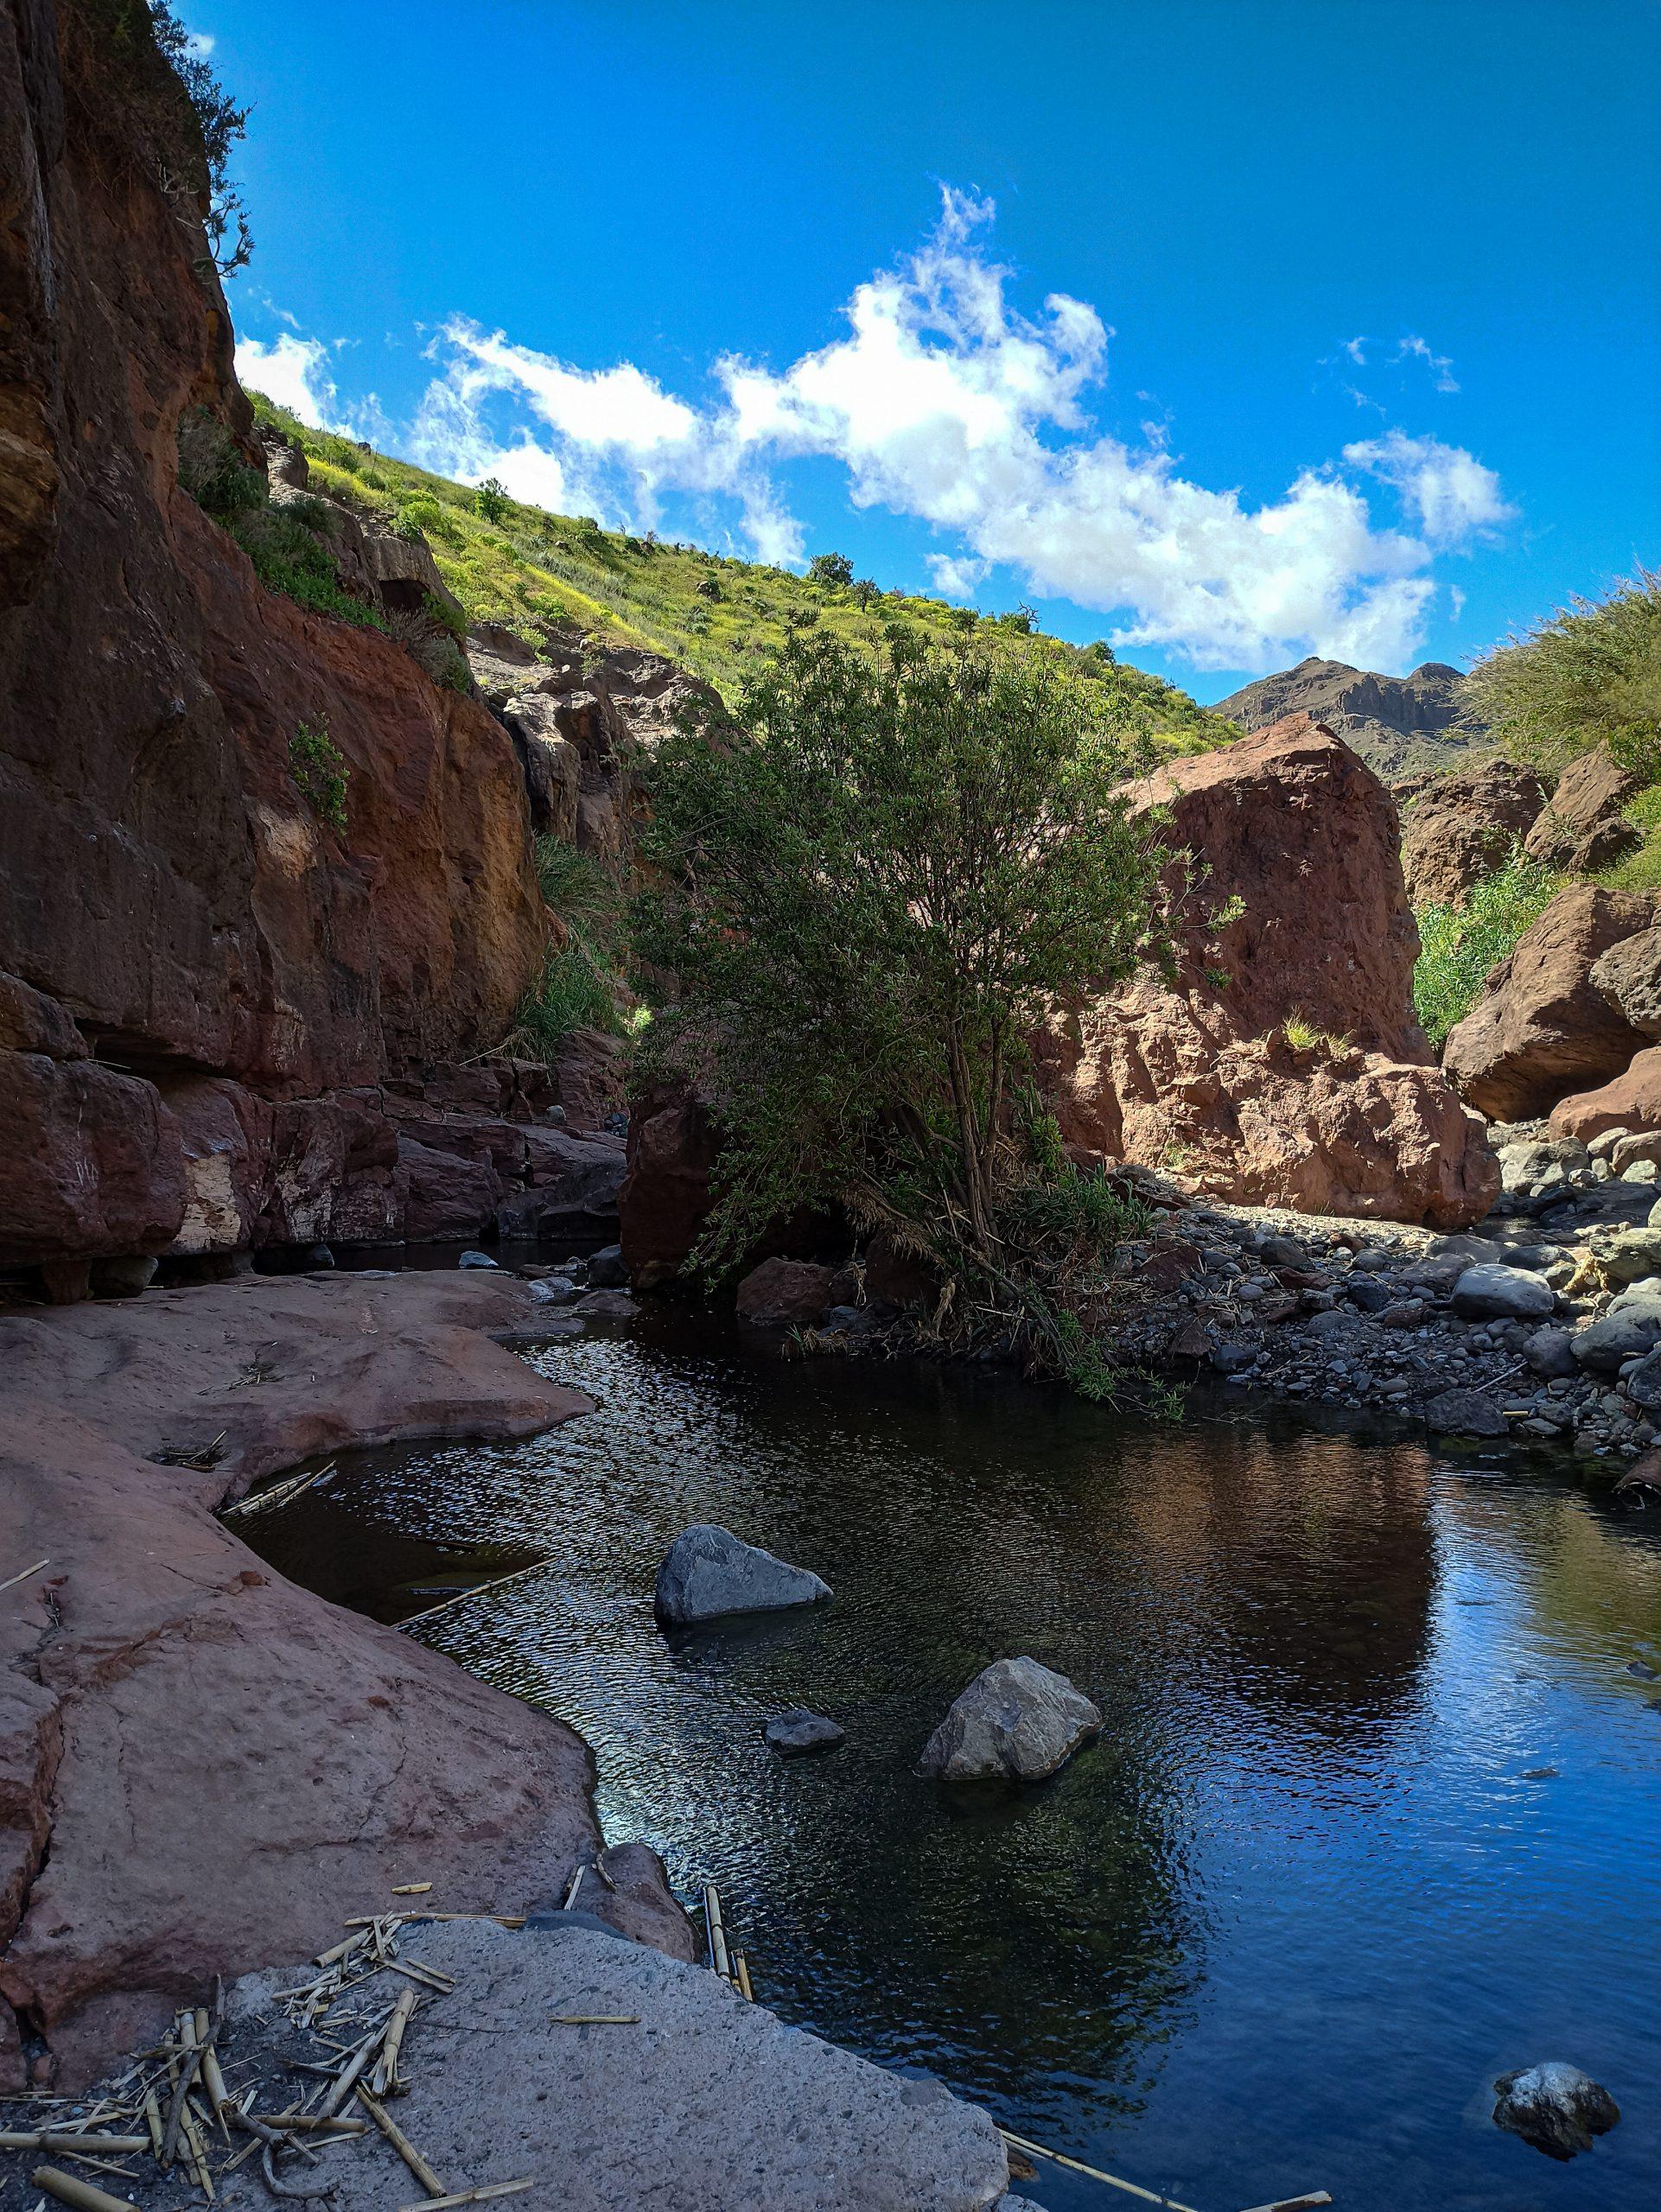 Klettern auf Gran Canaria - La Sorrueda